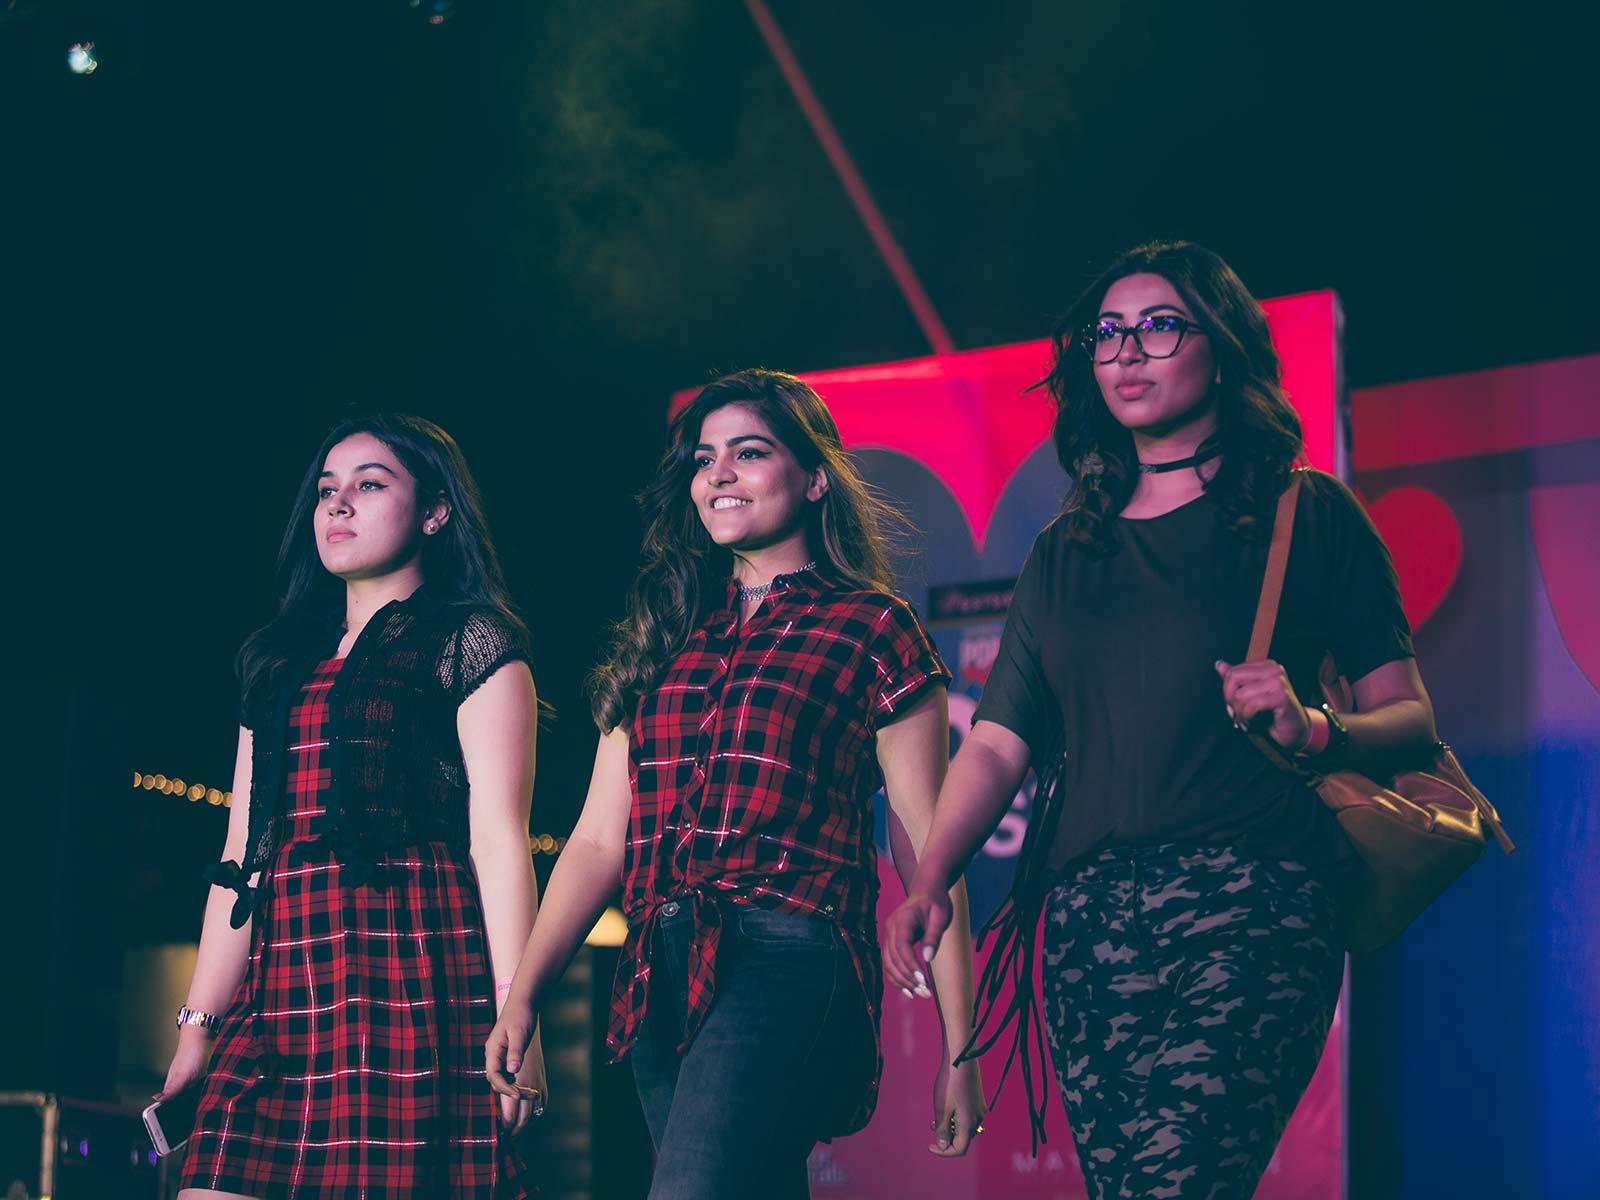 Shaily Khera, Kritika Khurana and Shristi Singh walk the ramp for Westside at the POPxo Love Fest